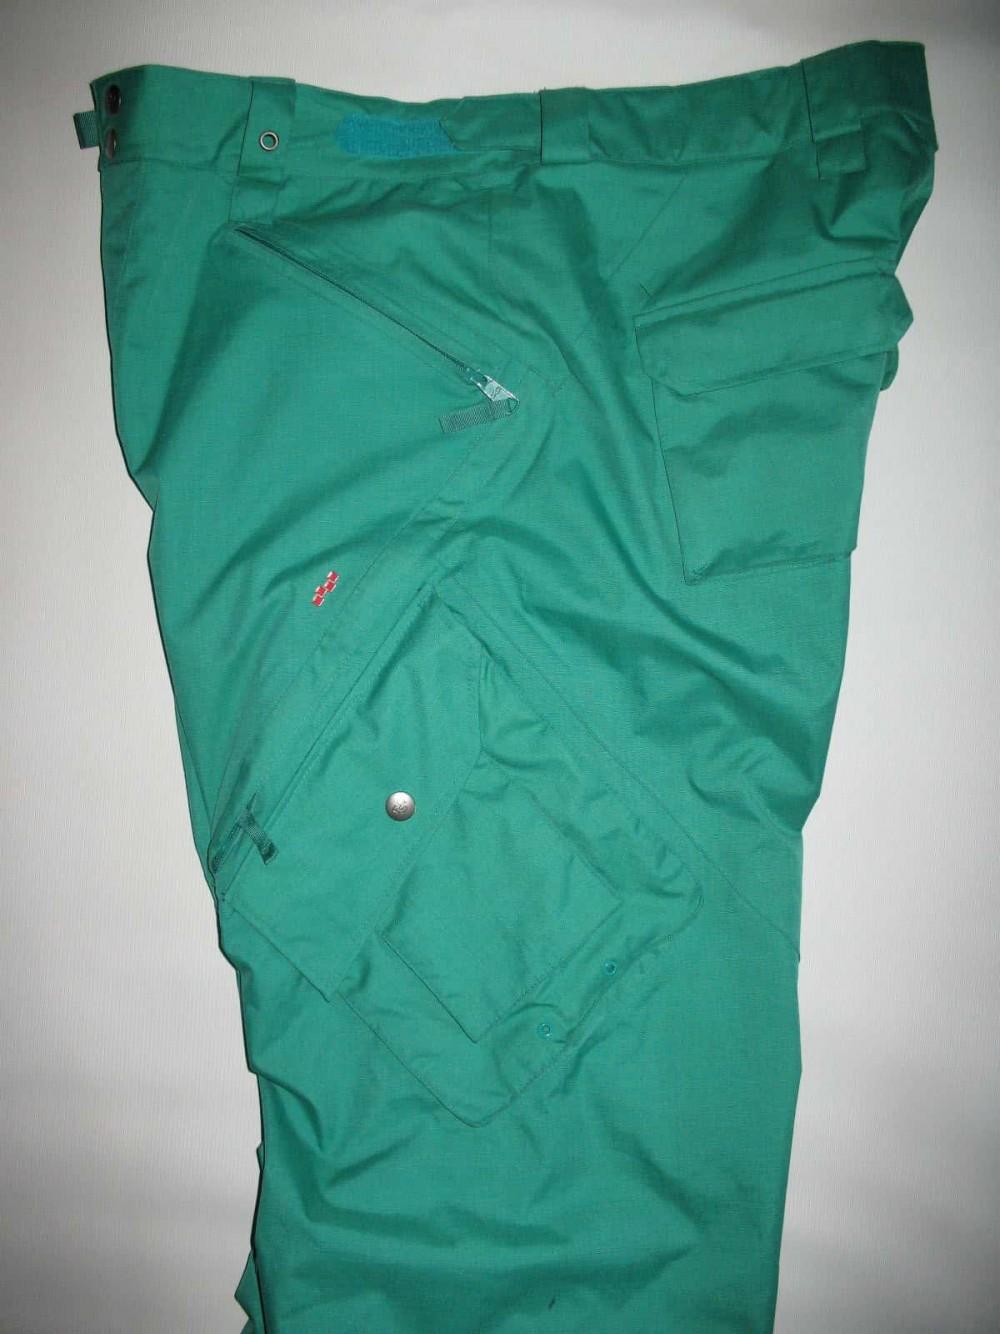 Штаны FOURSQUARE q snowboard pants (размер XL) - 8